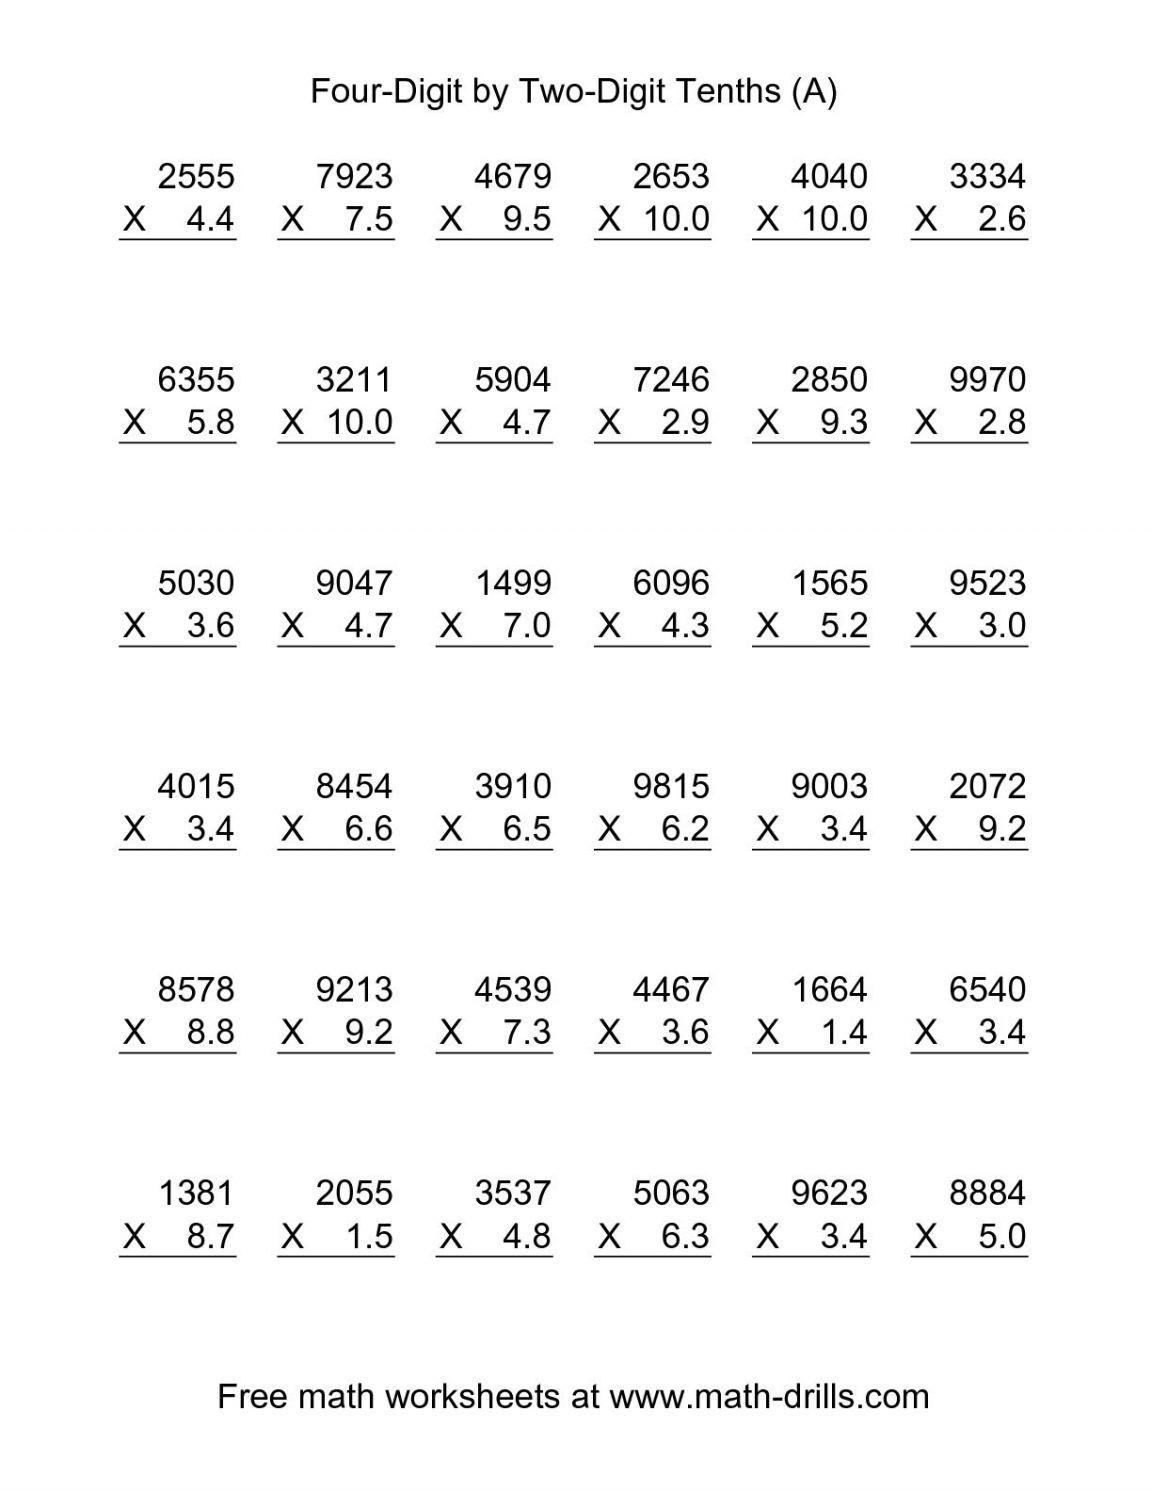 Fair Division And Multiplication Worksheets For 6th Grade For Multiplying Decimals Worksheets Decimals Worksheets Math Worksheets